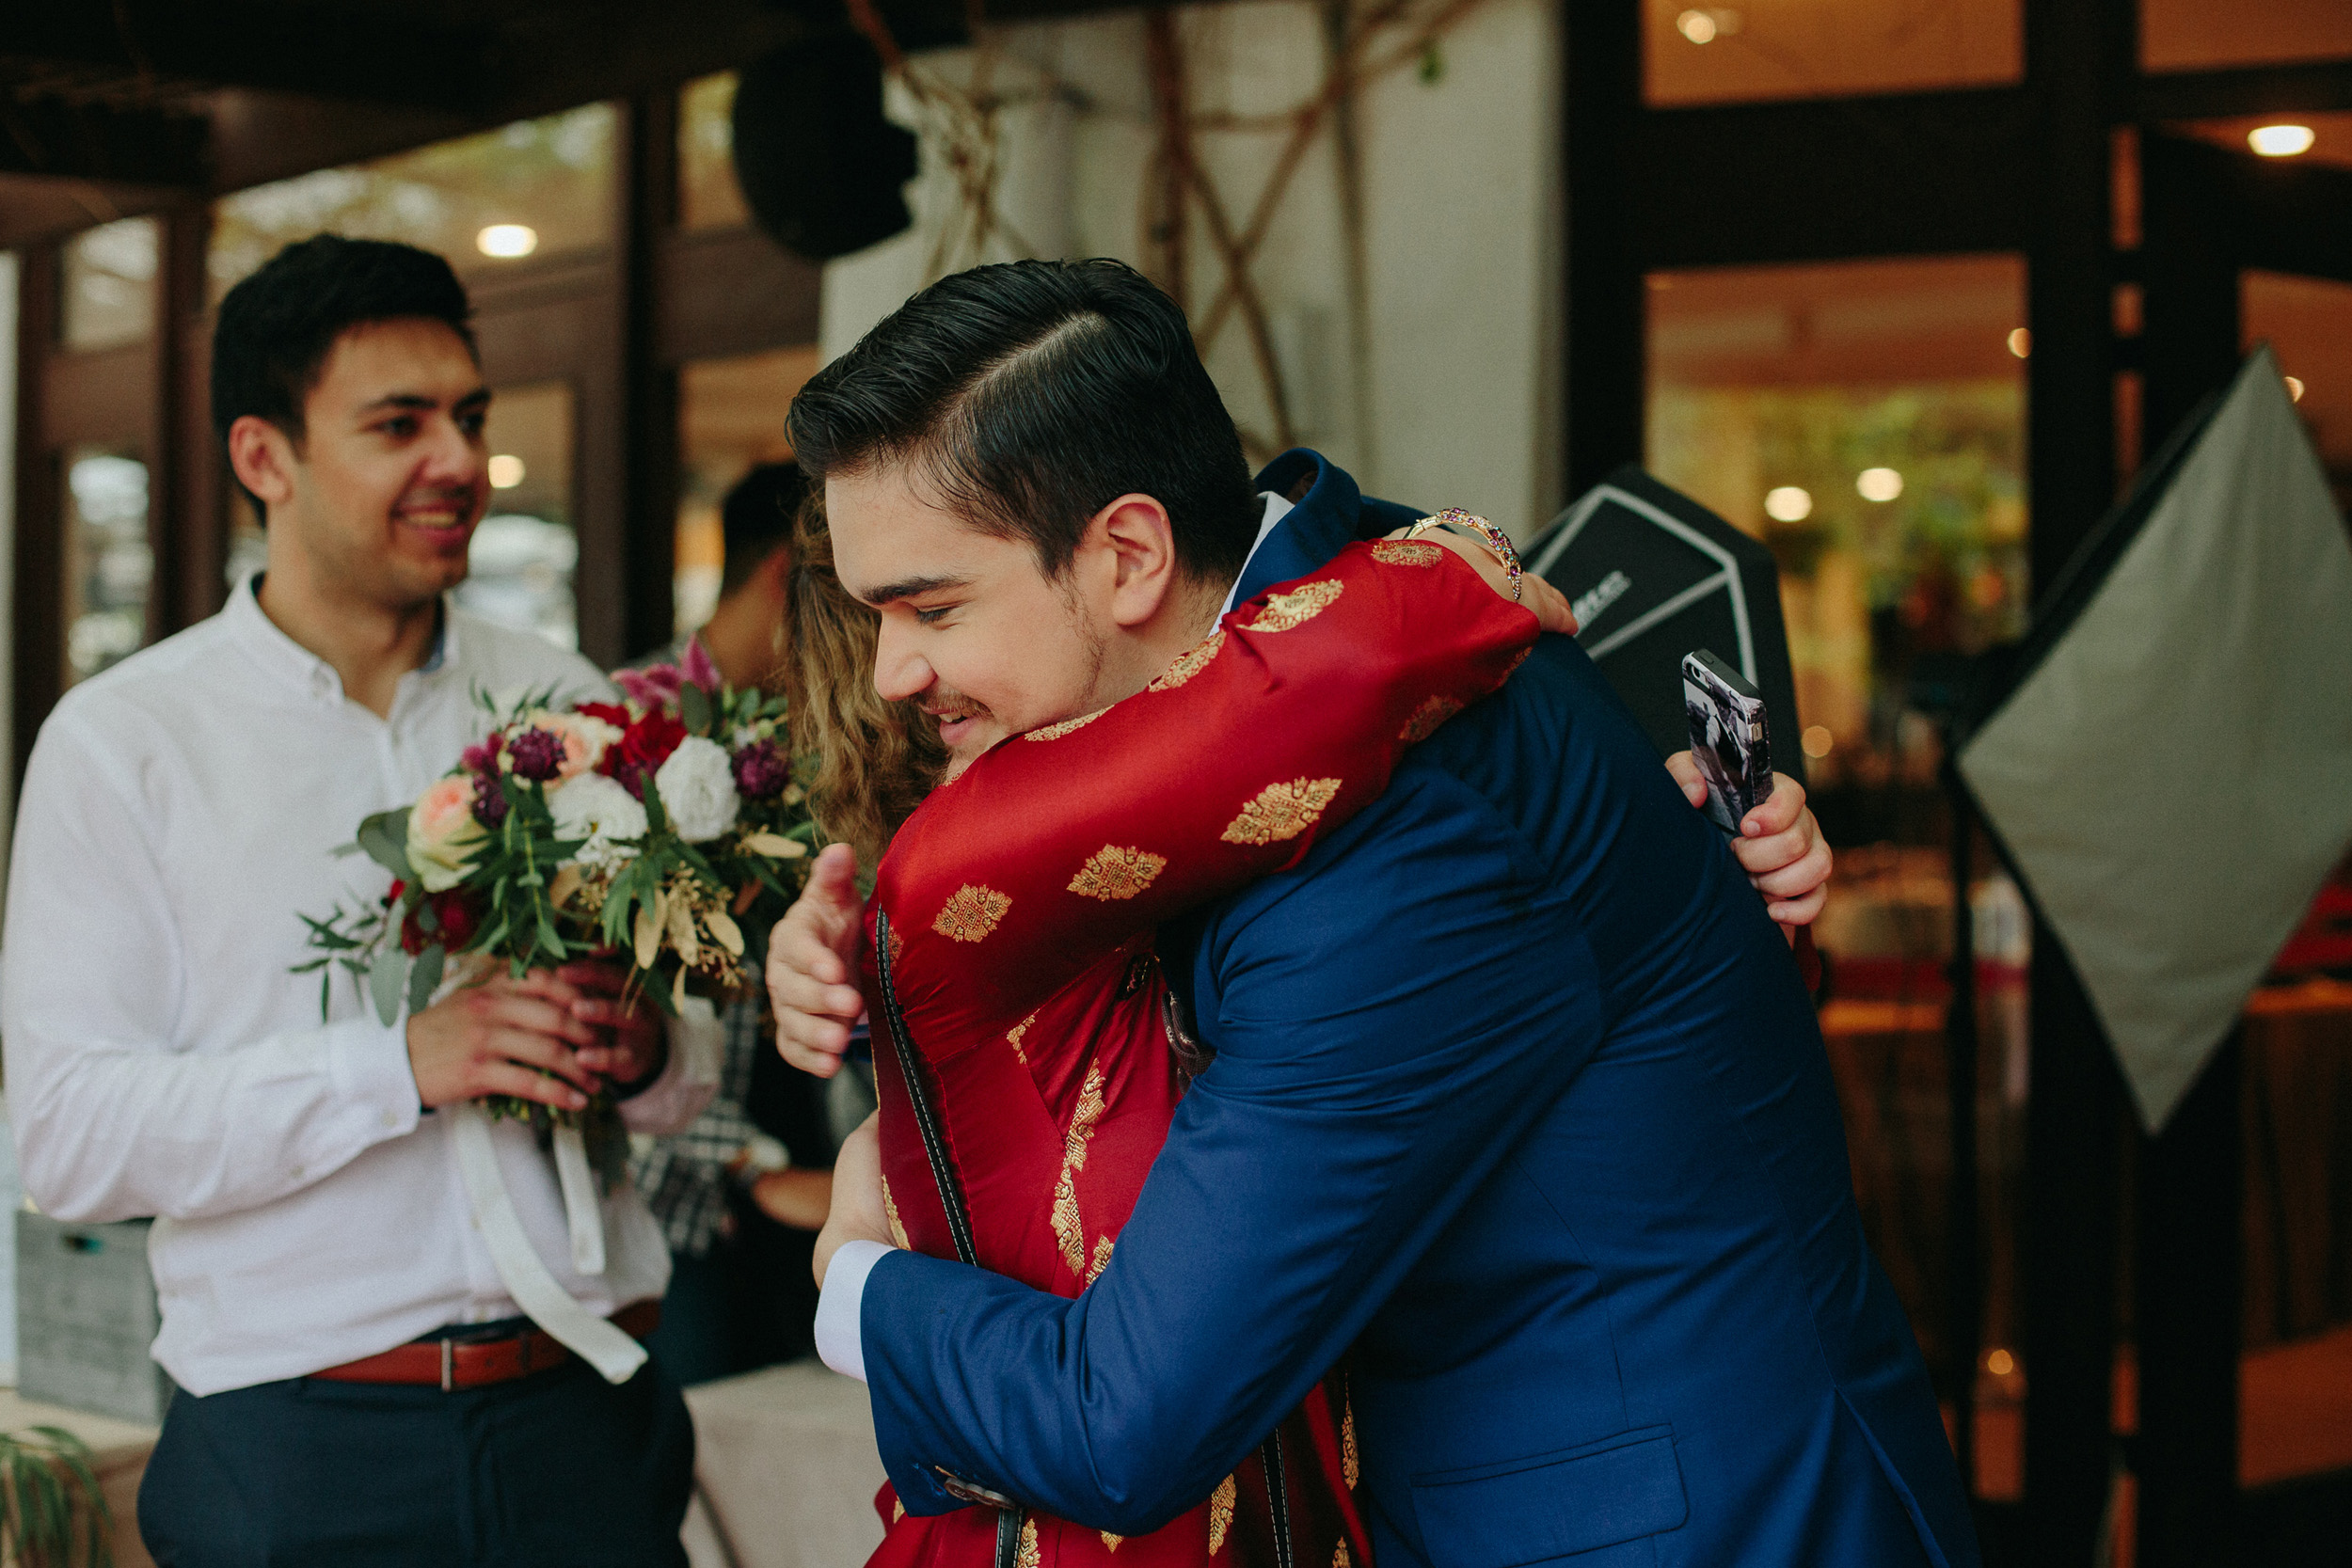 singapore-wedding-photographer-photography-wmt2017-119.jpg